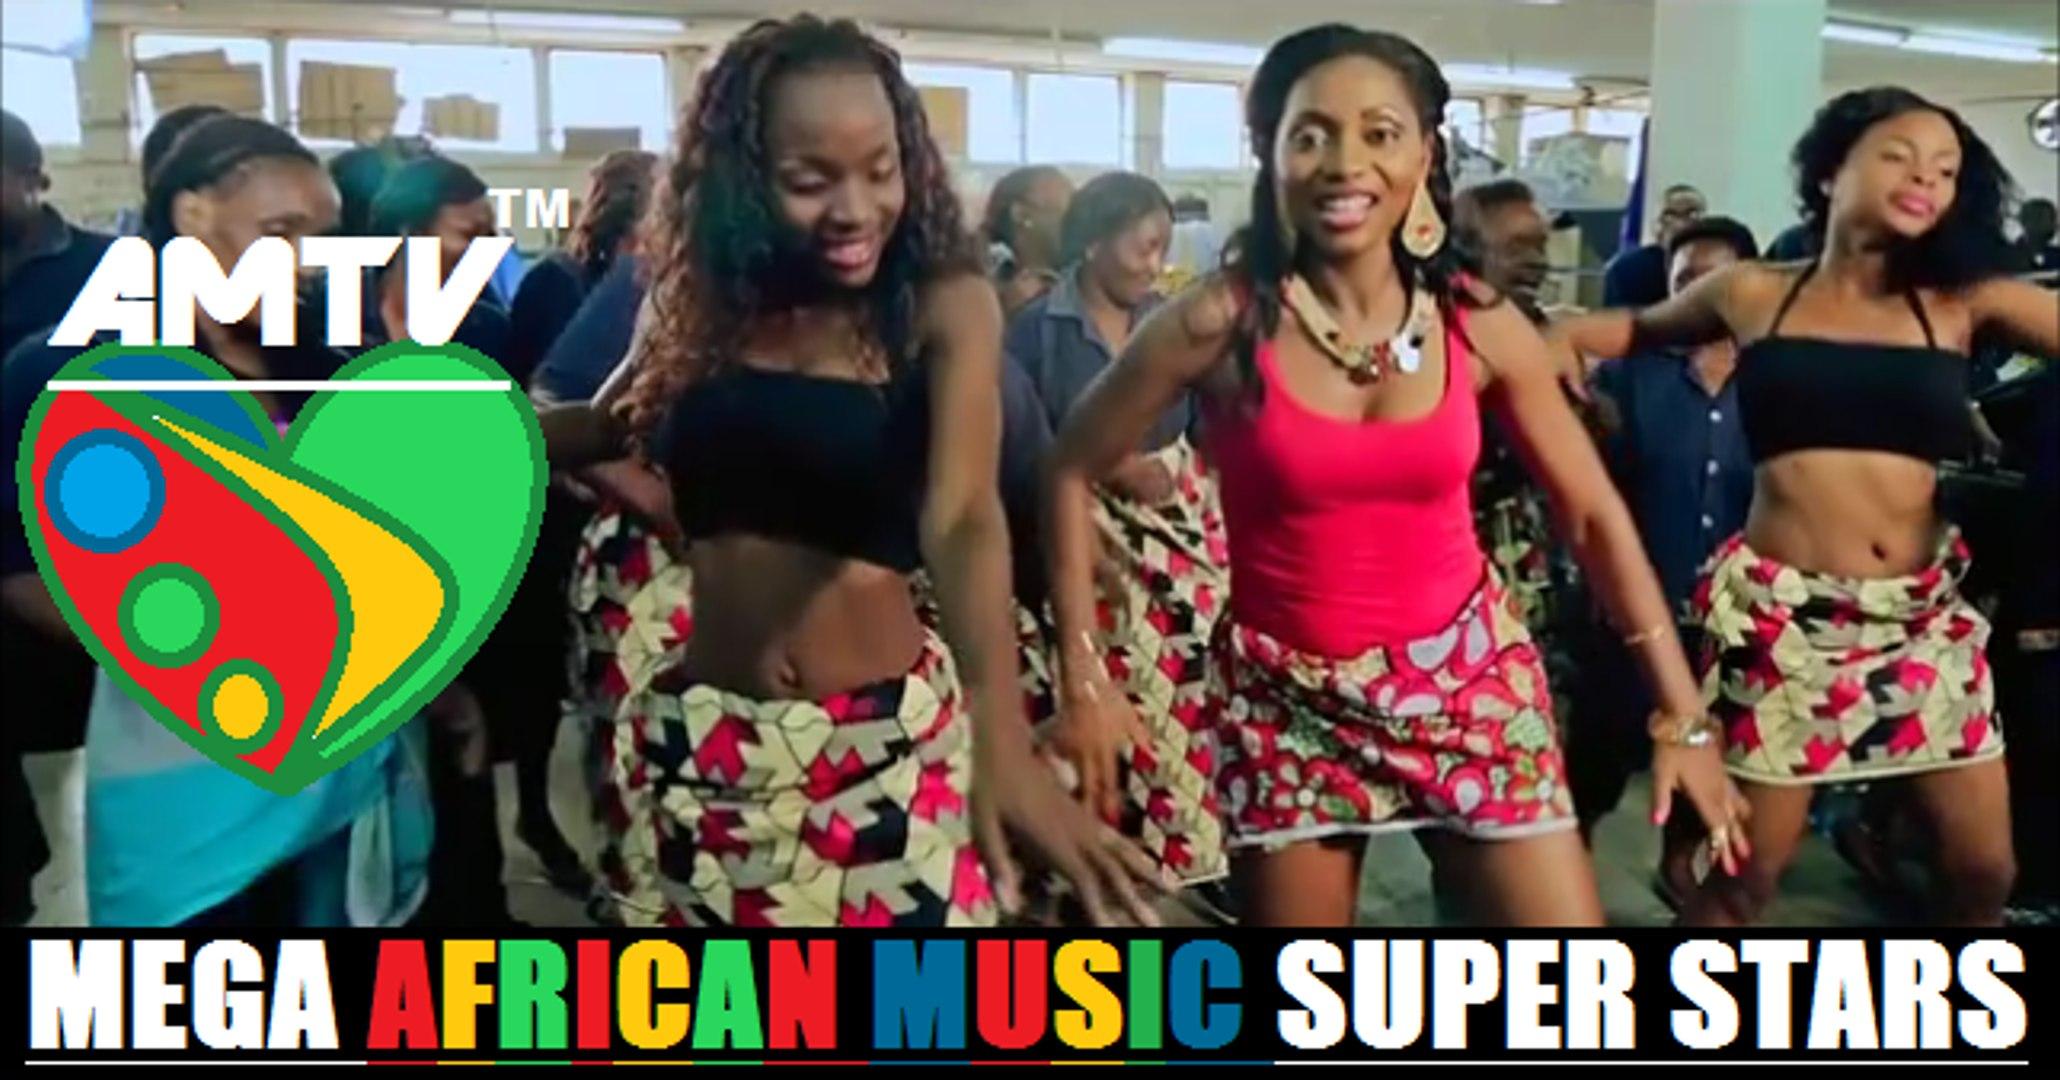 AFRICAN DANCE MUSIC - Anita Macuacua - Ngunhuta (Official Music Video) -  MOZAMBIQUE - AFRICAN MUSIC TV - [ #AMTVjams ]